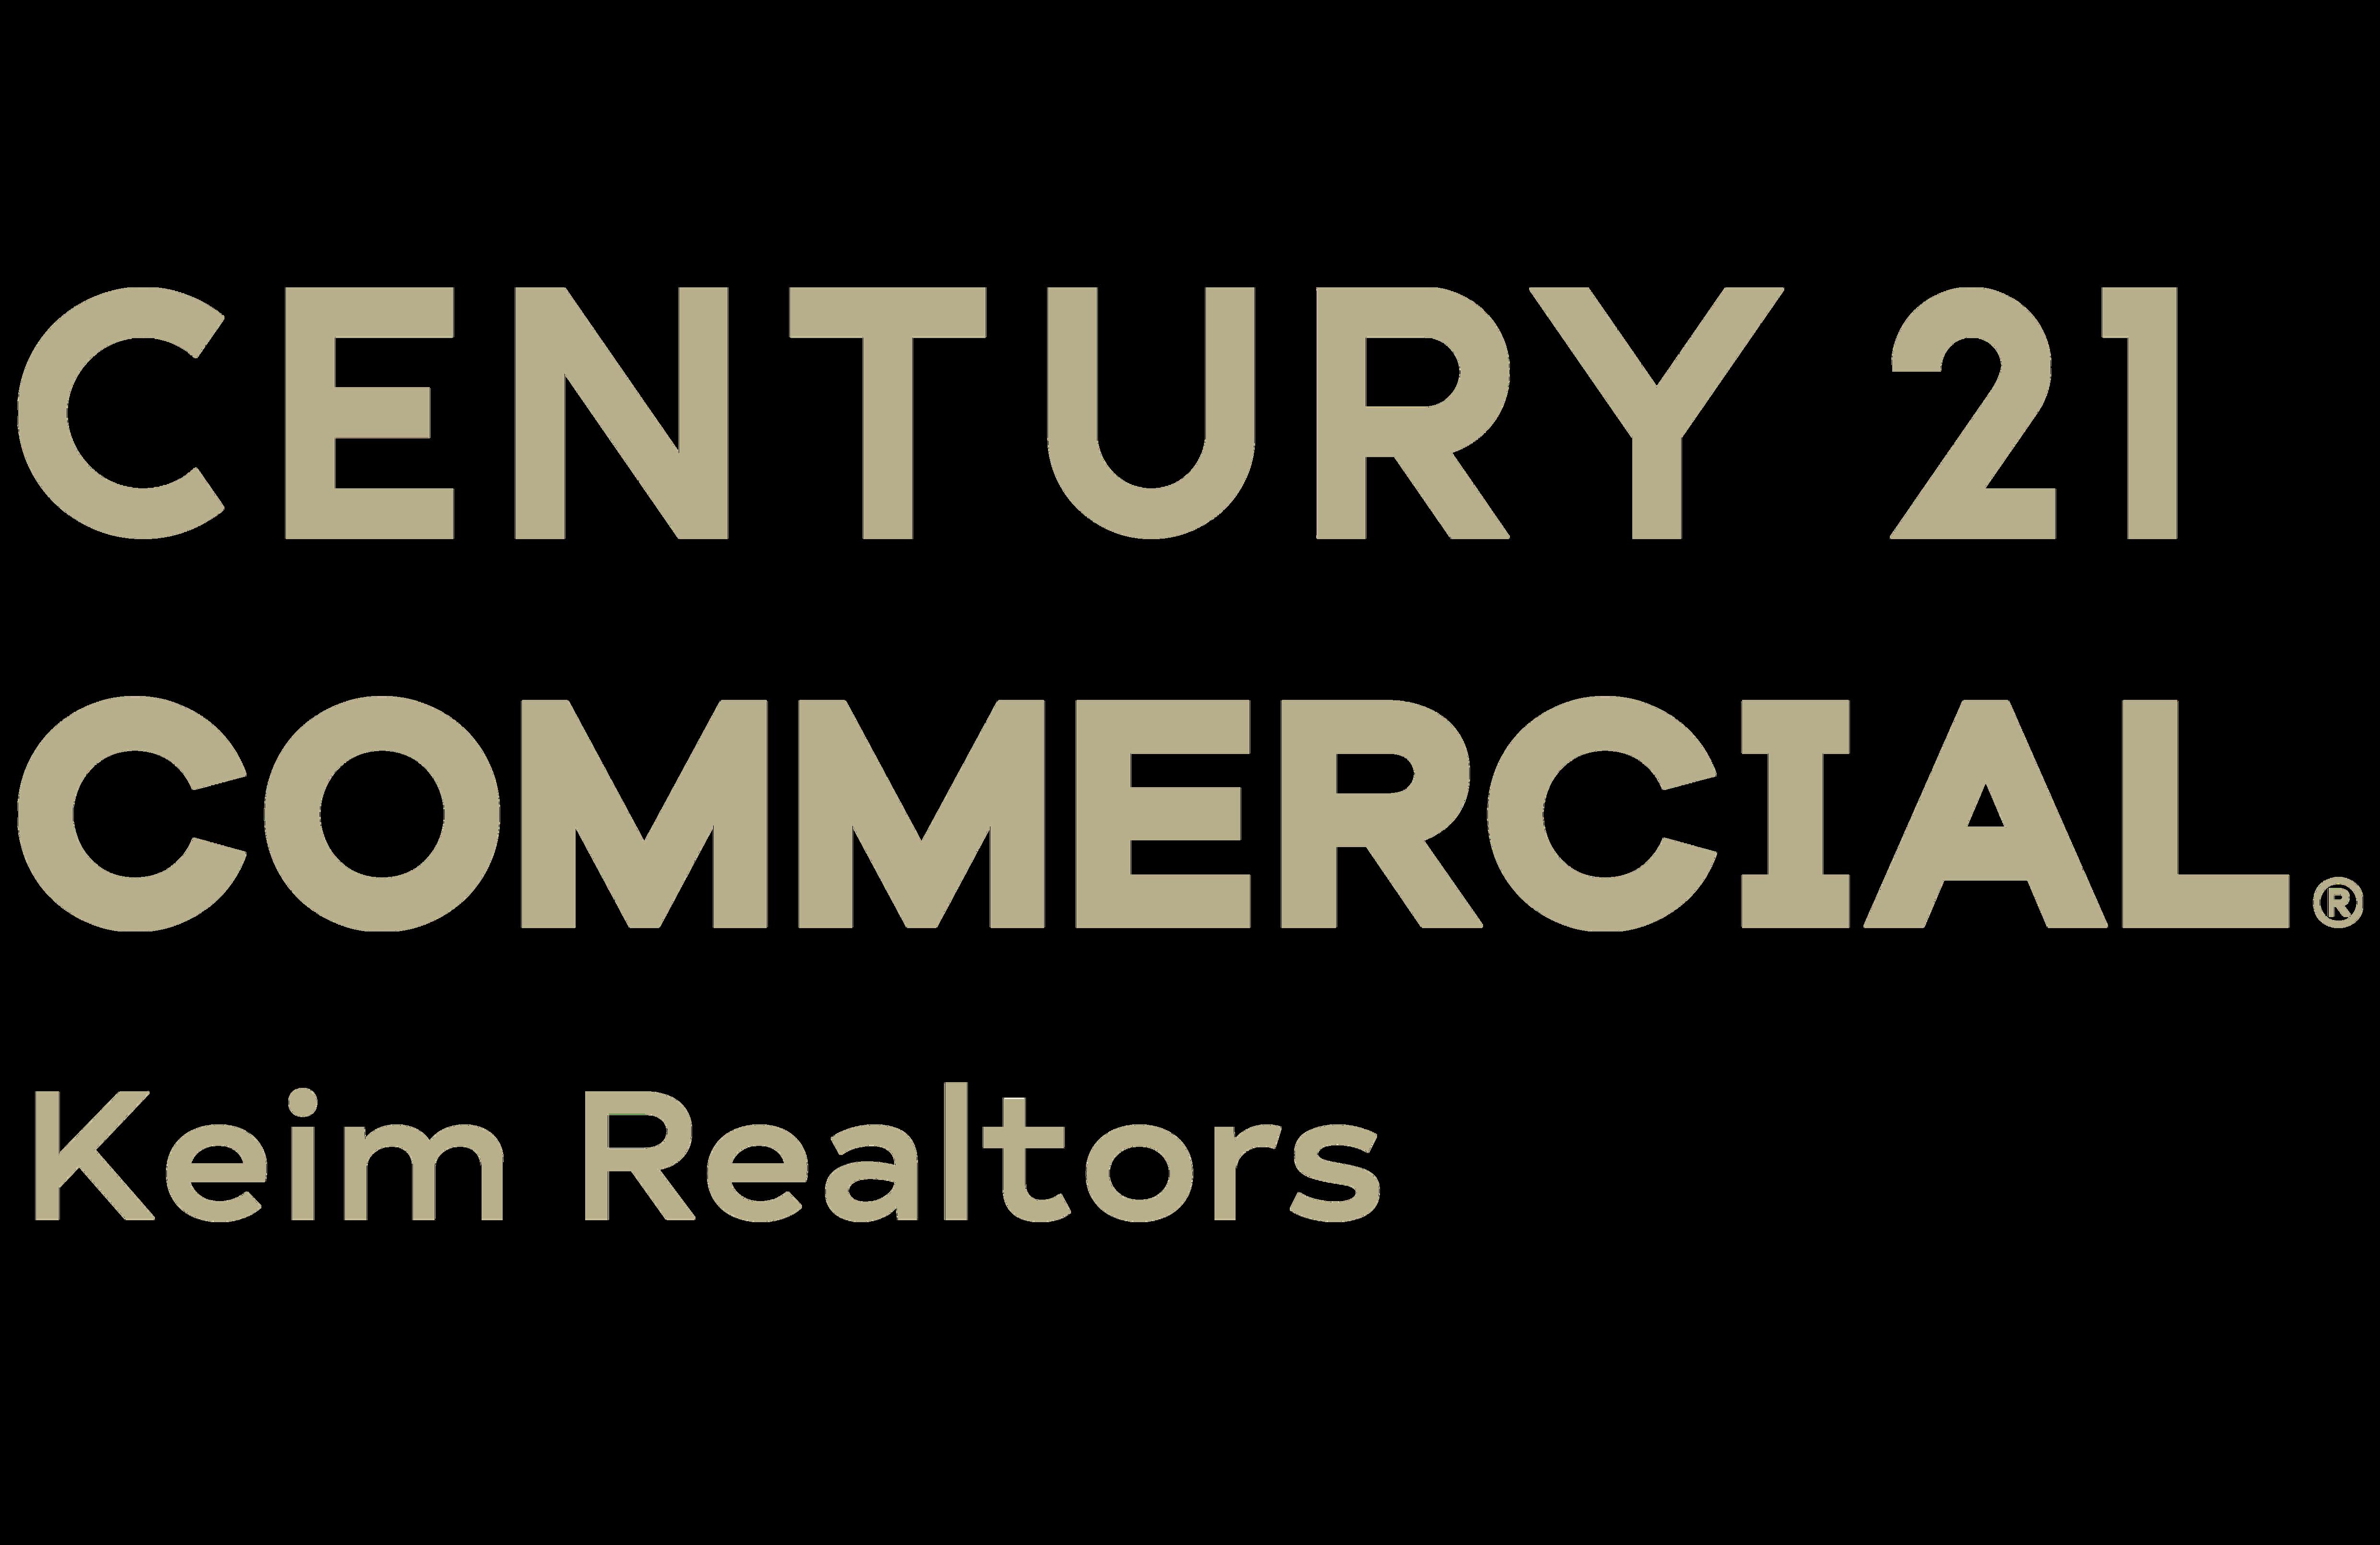 Michele Fedorov of CENTURY 21 Keim Realtors logo